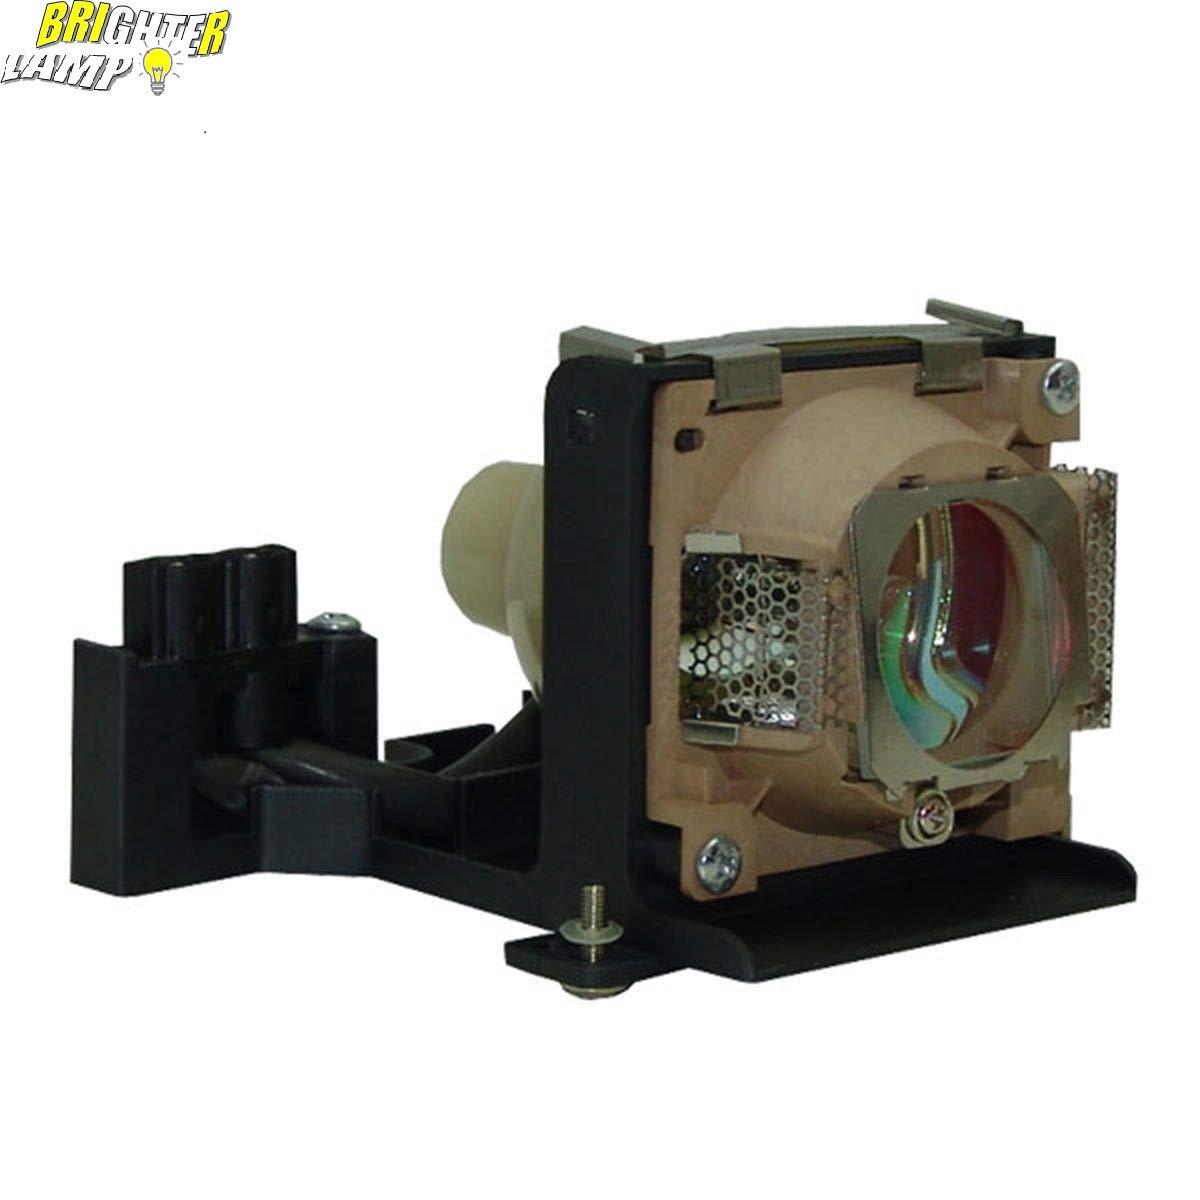 Brighter Lamp 60.J5016.CB1 / 59.J8401.CG1/ 60.J7693.CG1 プロジェクター交換用ランプ for Benq PB7235, Benq PB7210, Benq PB7200.【高品質バルブ採用/高輝度/長寿命】   B07HD43TZR